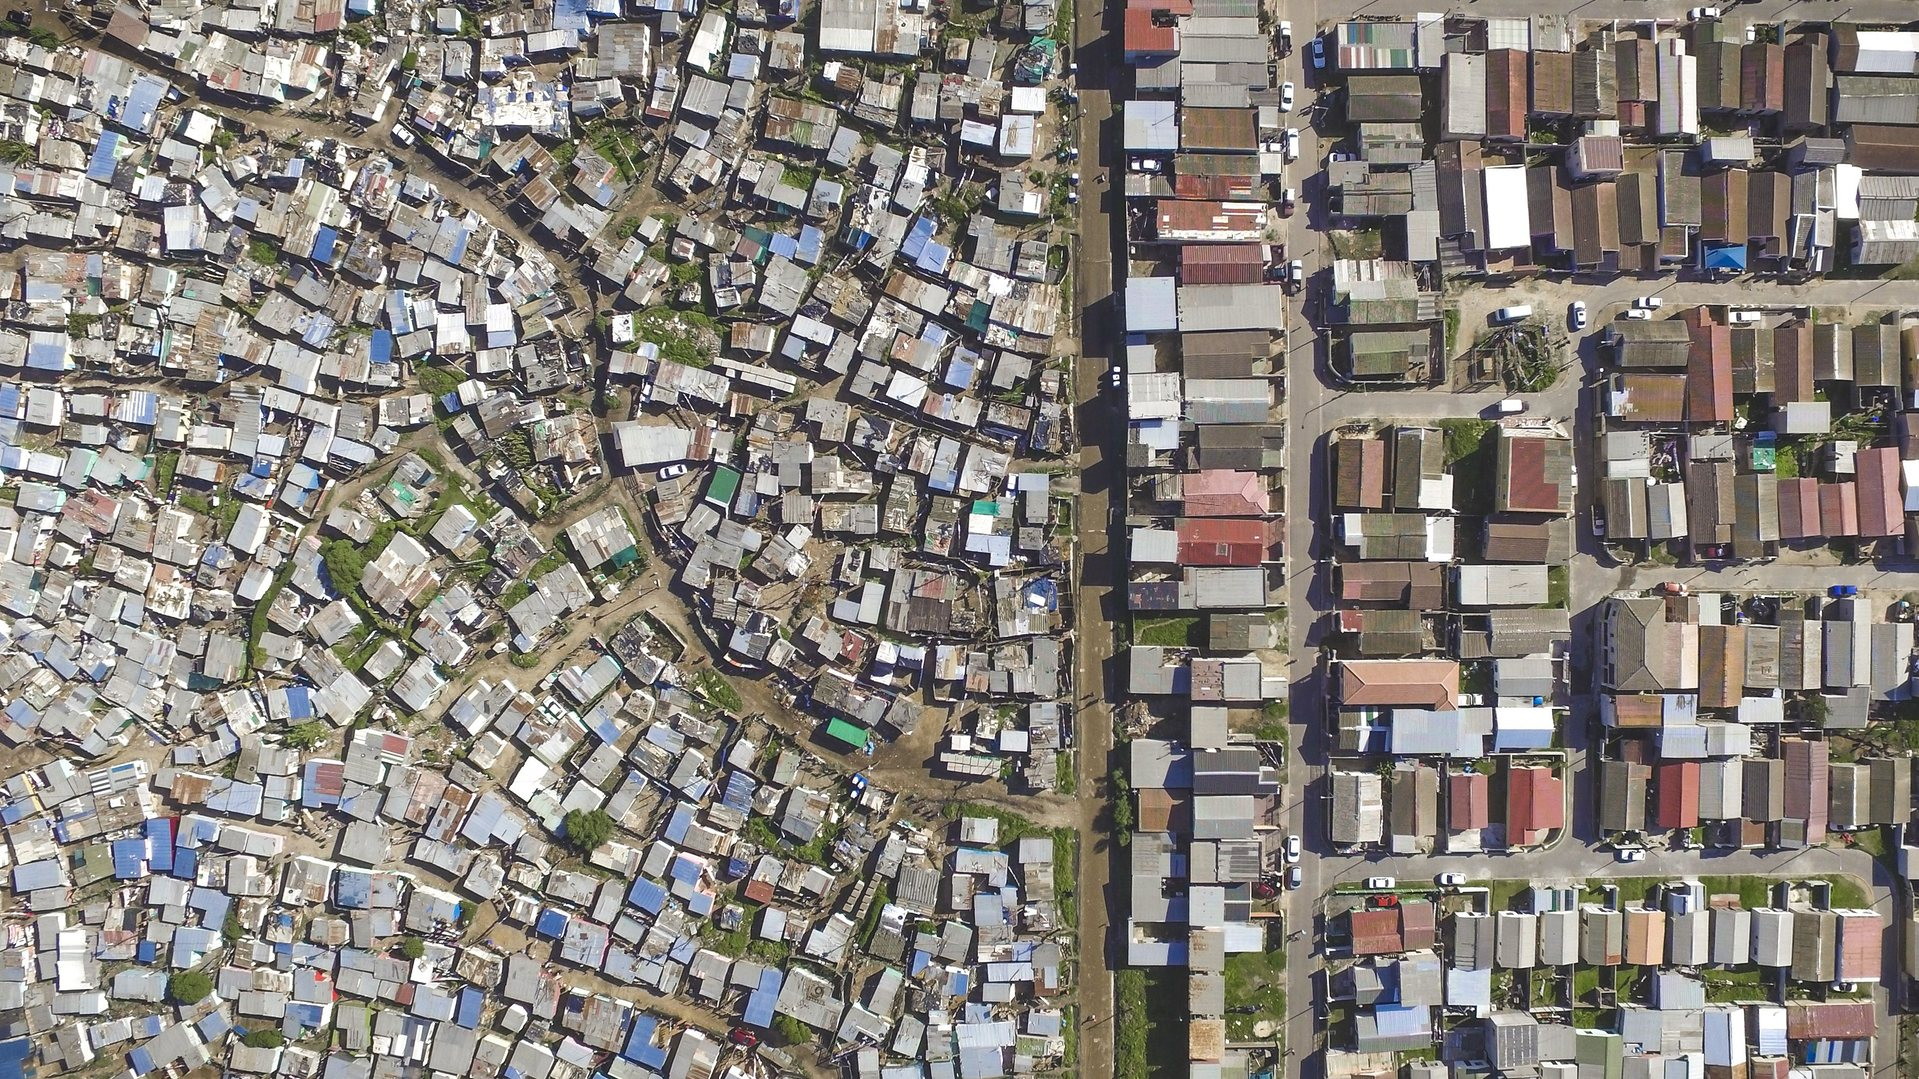 Lotus Park / Mannenberg (Top) and Vukuzenzele/ Sweet Home Farm (Bottom) by Johnny Miller